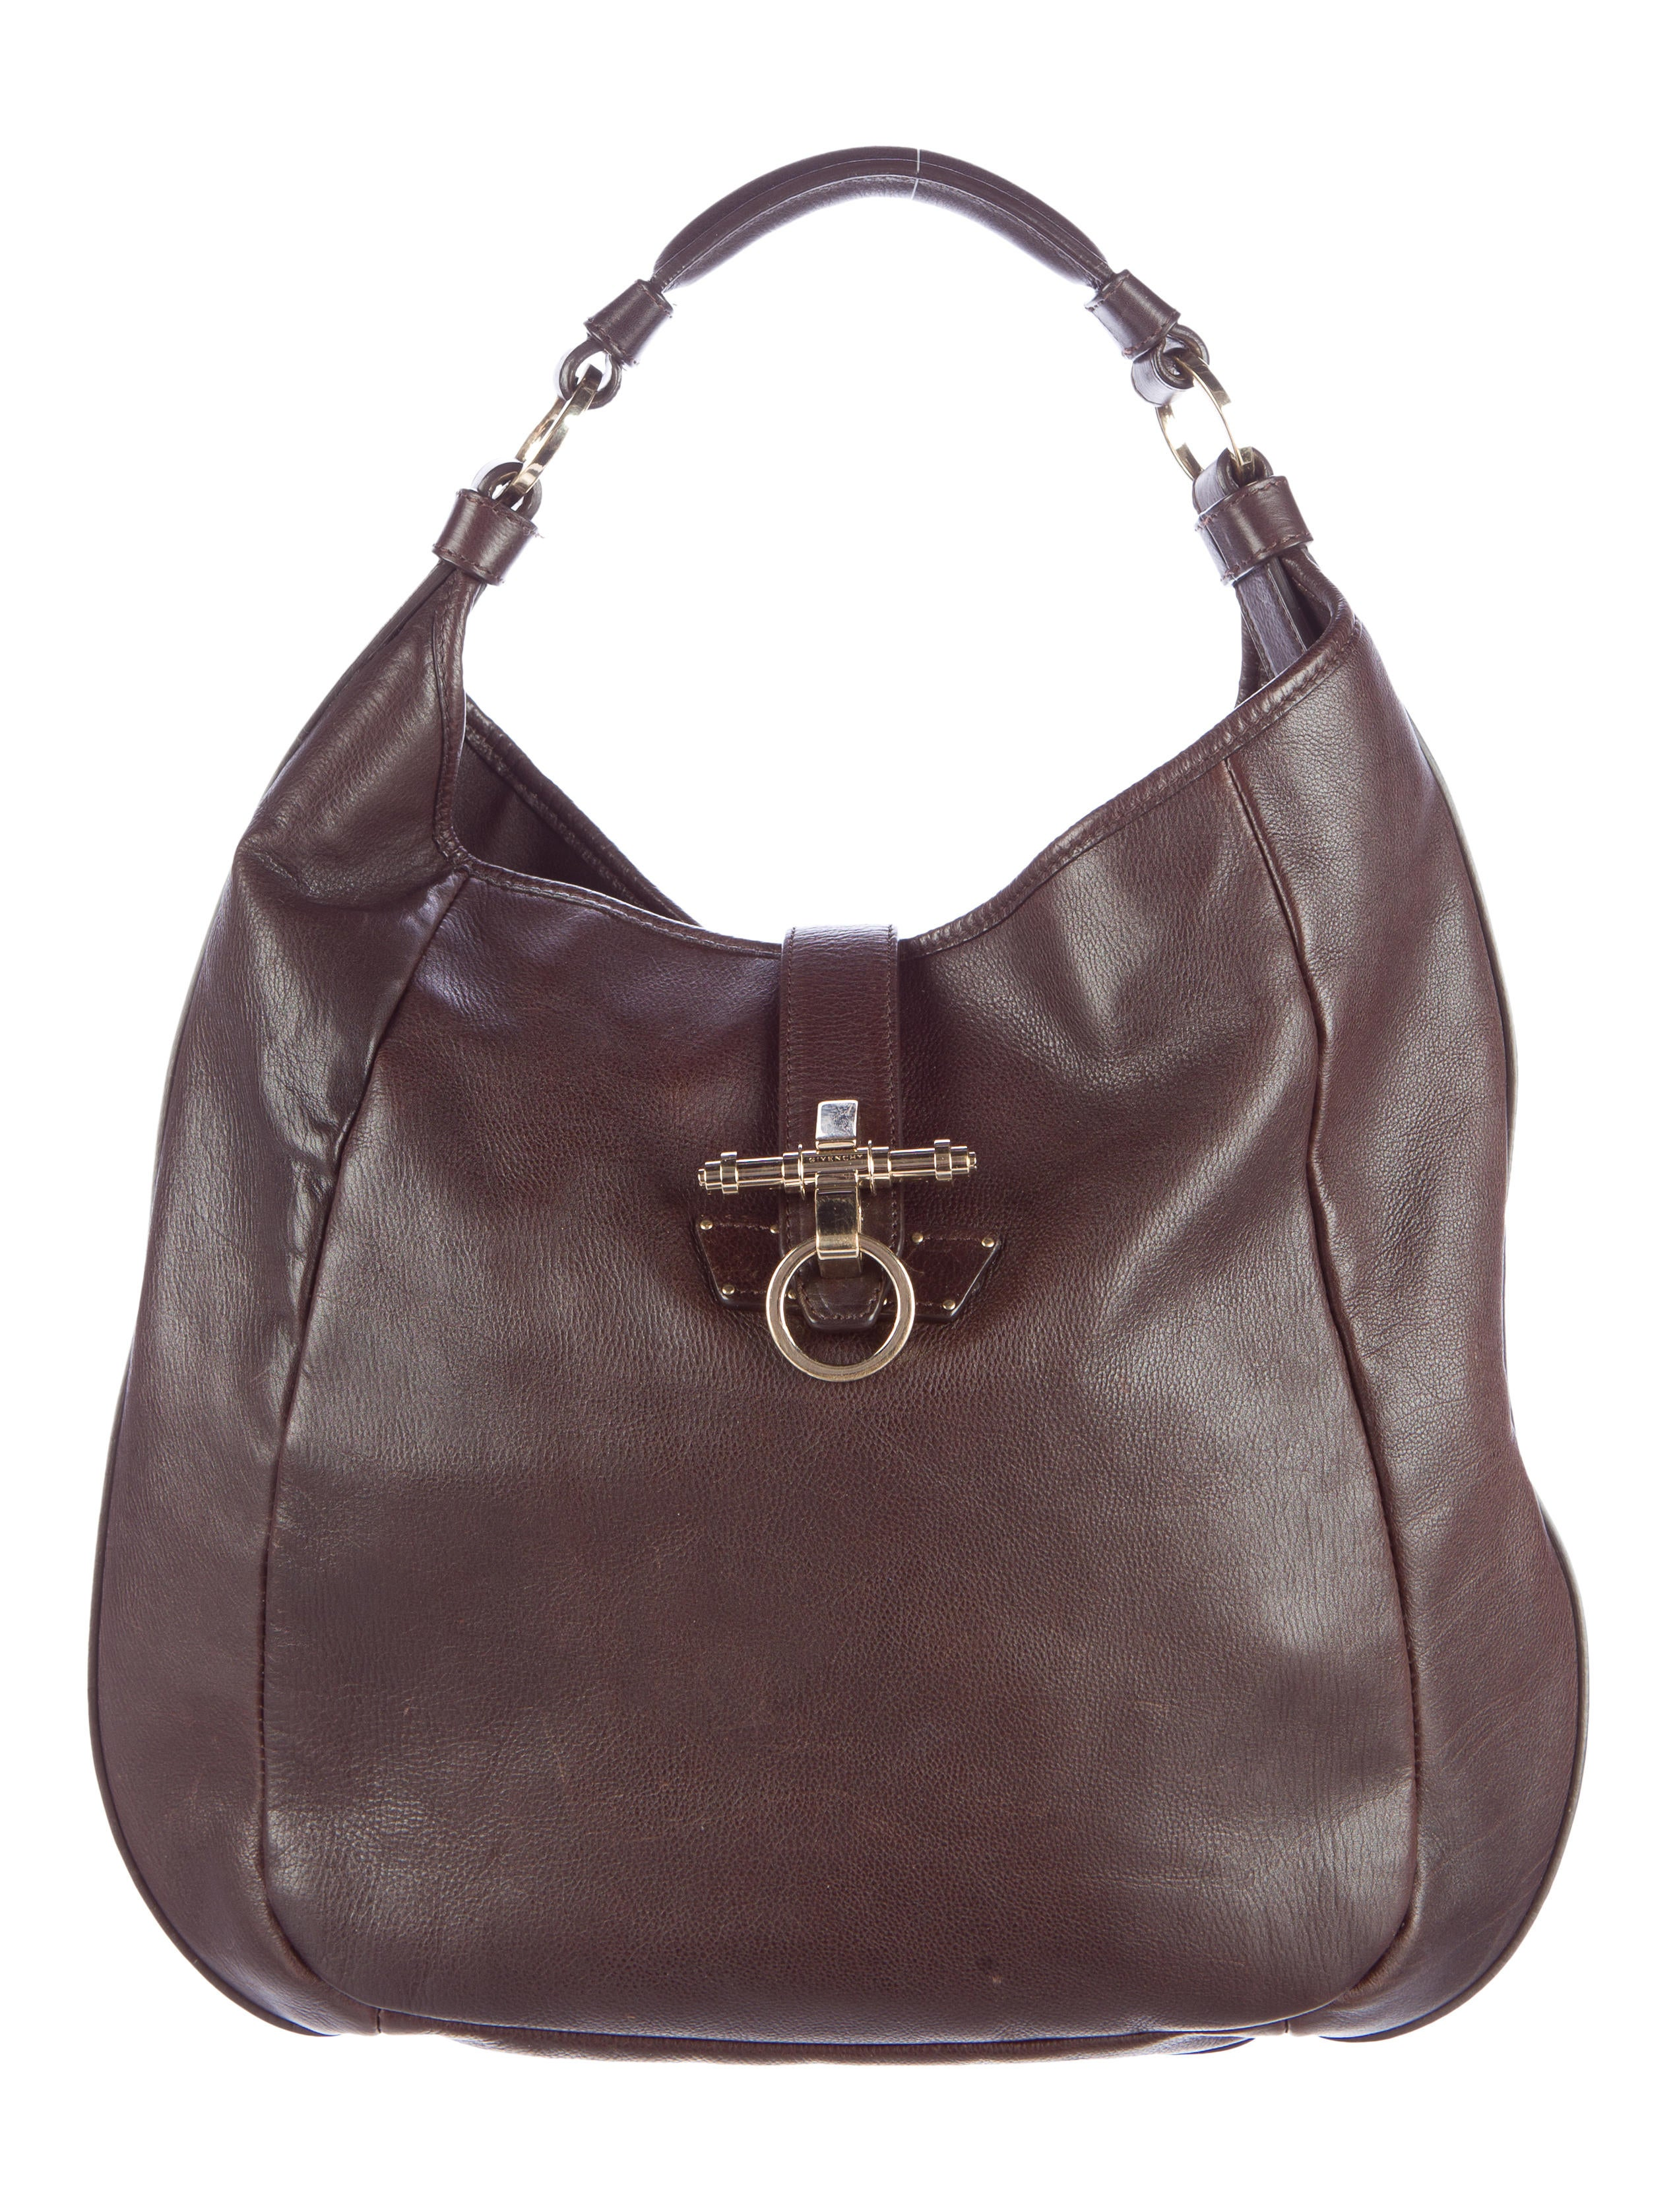 065aa3ac3a79 Givenchy Obsedia Shoulder Bag - Handbags - GIV31811